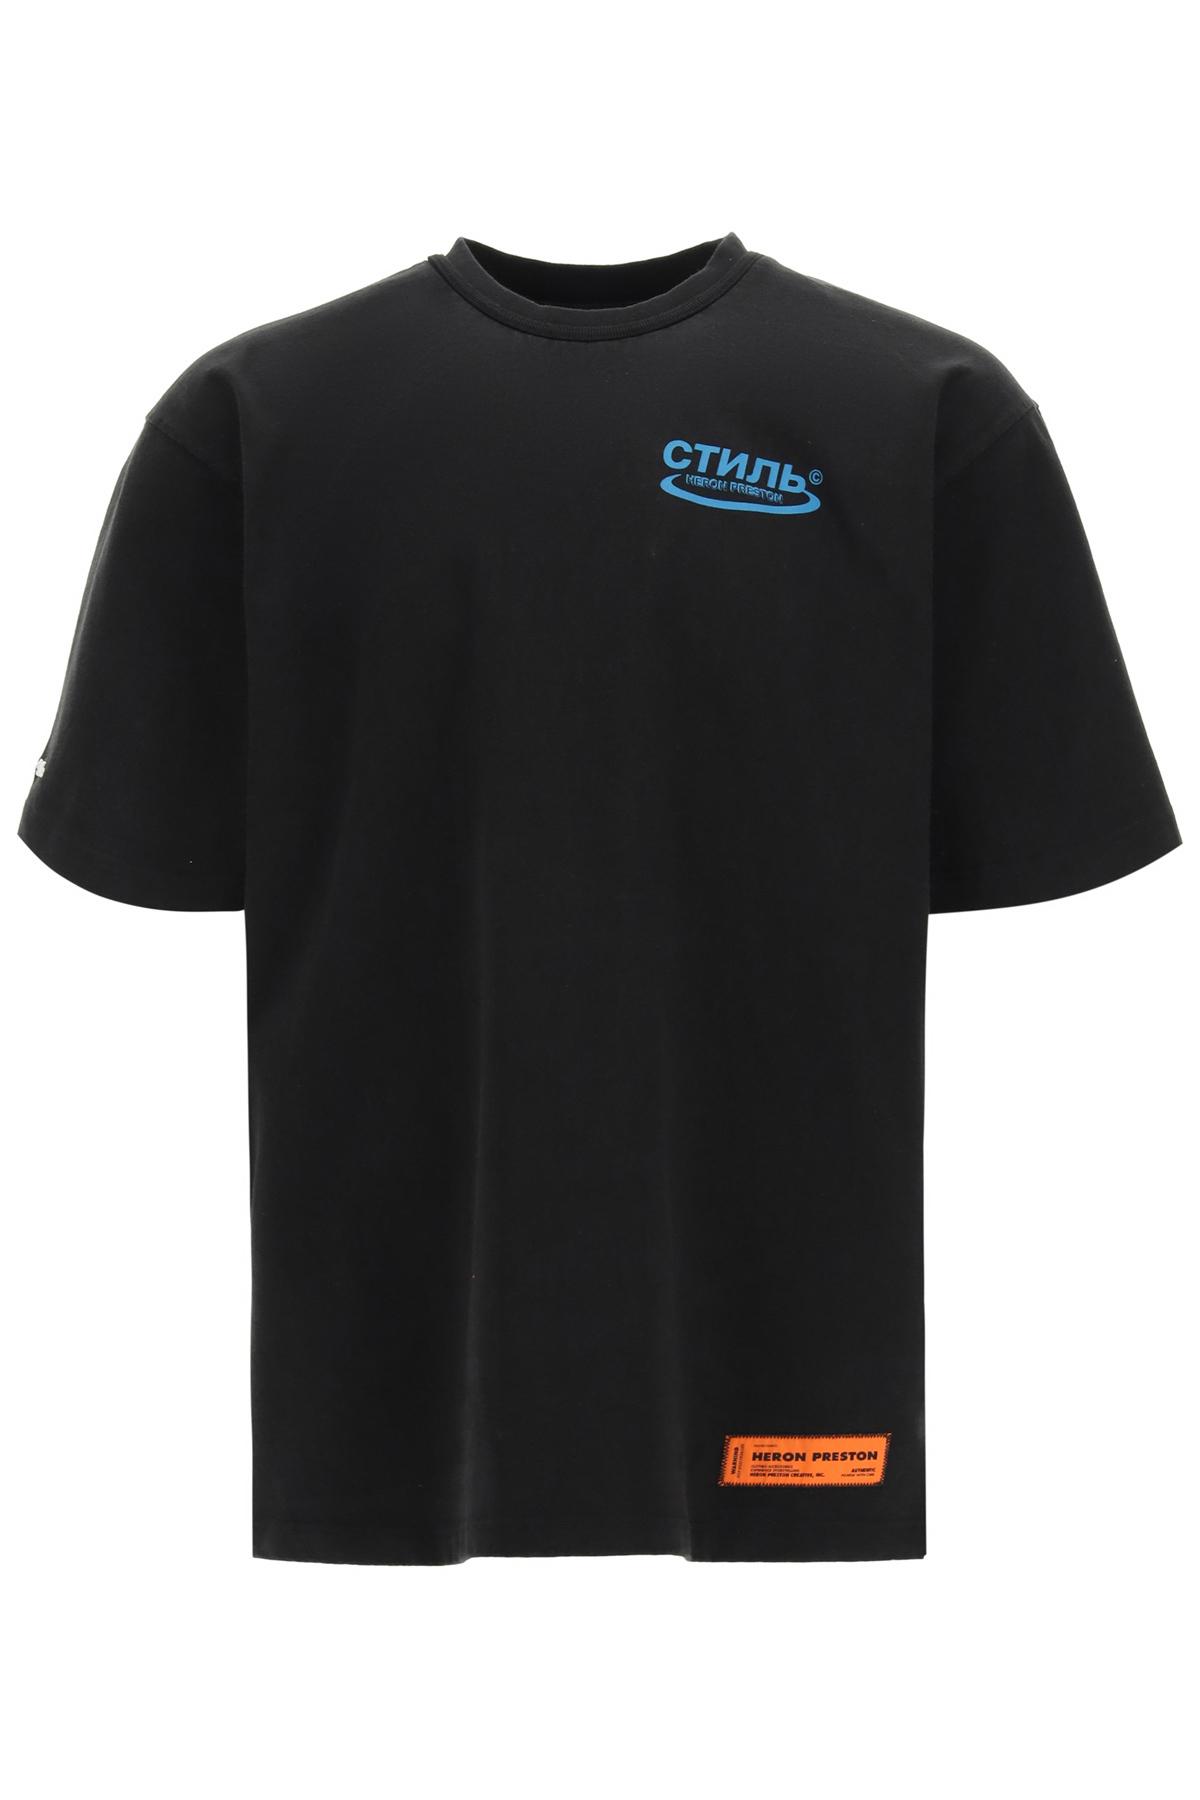 HERON PRESTON HERONS LITHO PRINT OVER T-SHIRT M Black, Blue, Orange Cotton